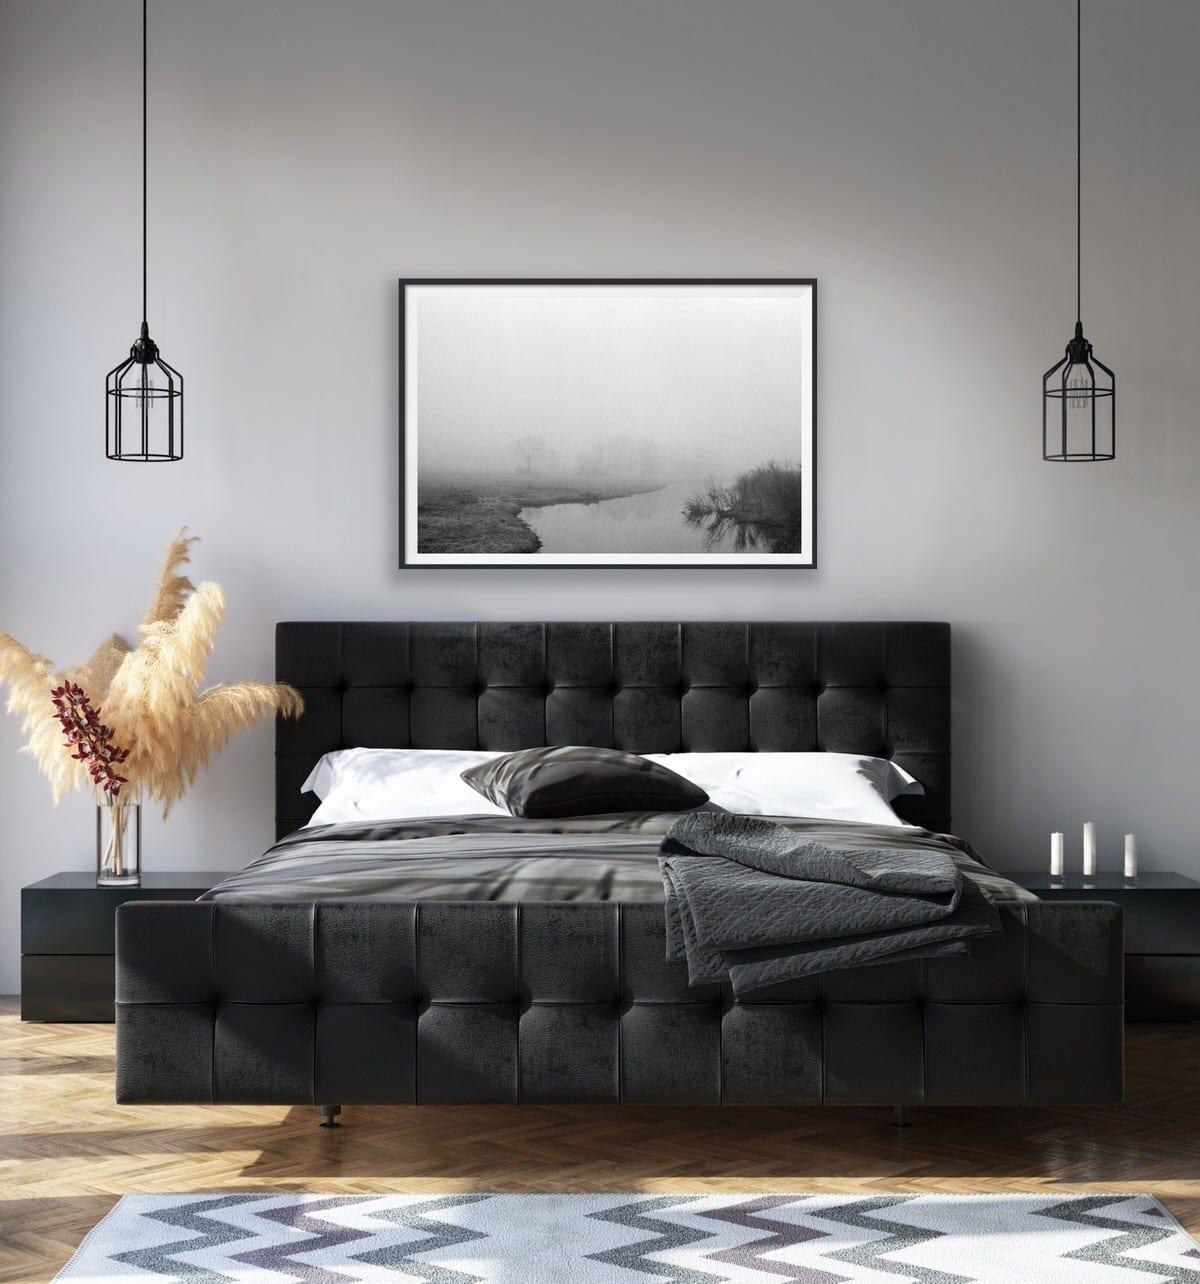 Black-and-white-fine-art-film-photography-wall-decor-by-emerging-artist-Studio-L-photographer-Laura-Schneider-_4703